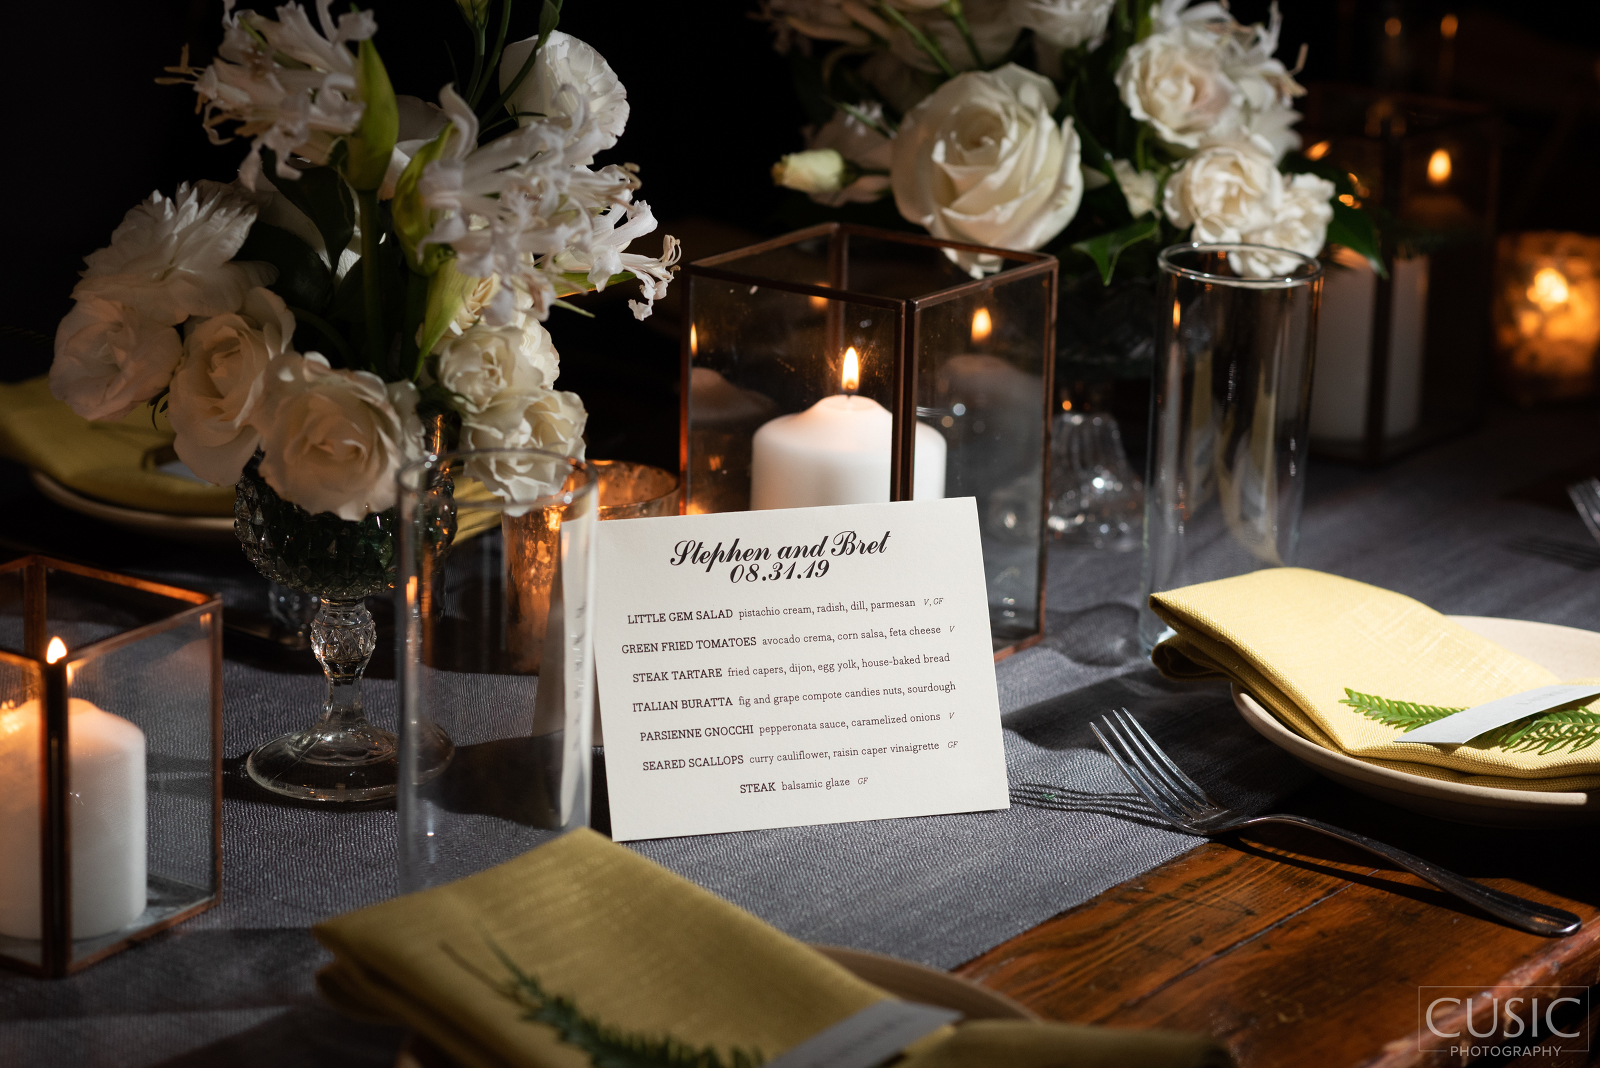 Chicago gay weddings by Candice Cusic